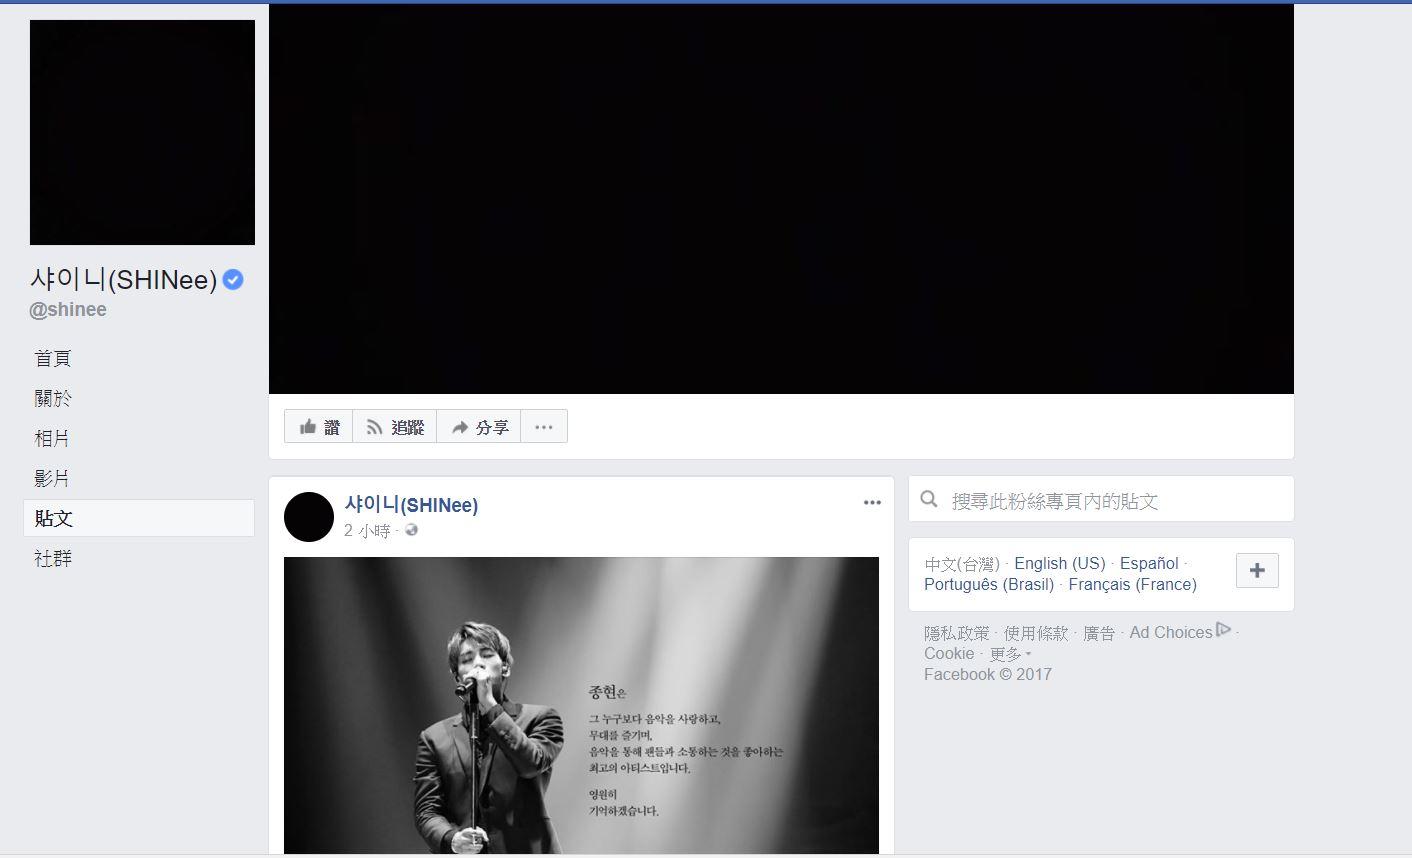 SM娛樂旗下藝人們全體籠罩在悲痛的情緒之中,SHINee的官方帳號統一換成黑圖,以此弔唁靈魂歌手鐘鉉的離開。